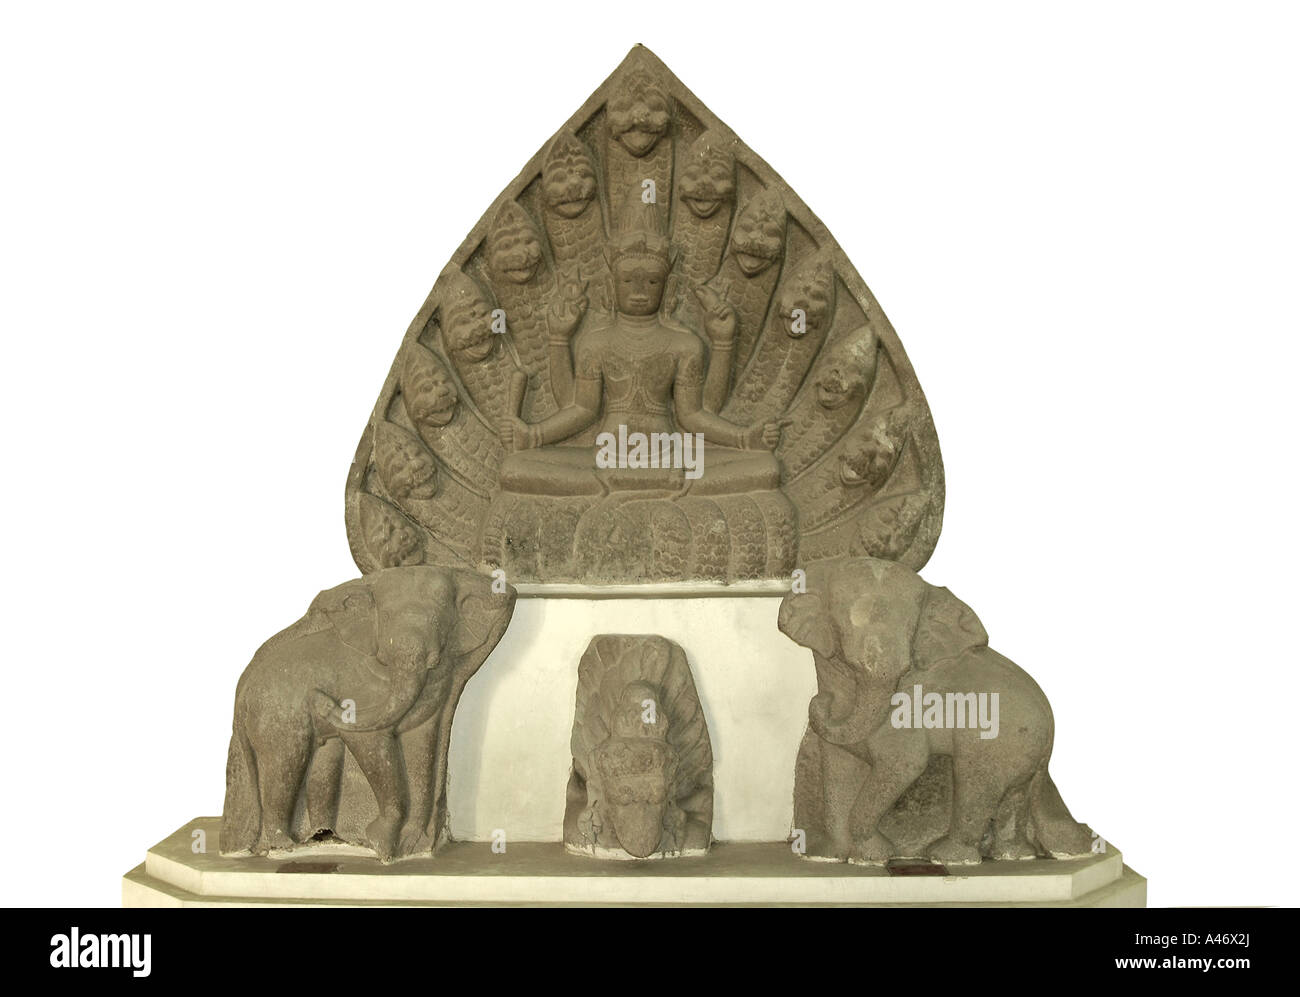 Vishnu sitting on snake Ananta, 10th century, Cham Sculpture Museum, Danang, Vietnam - Stock Image